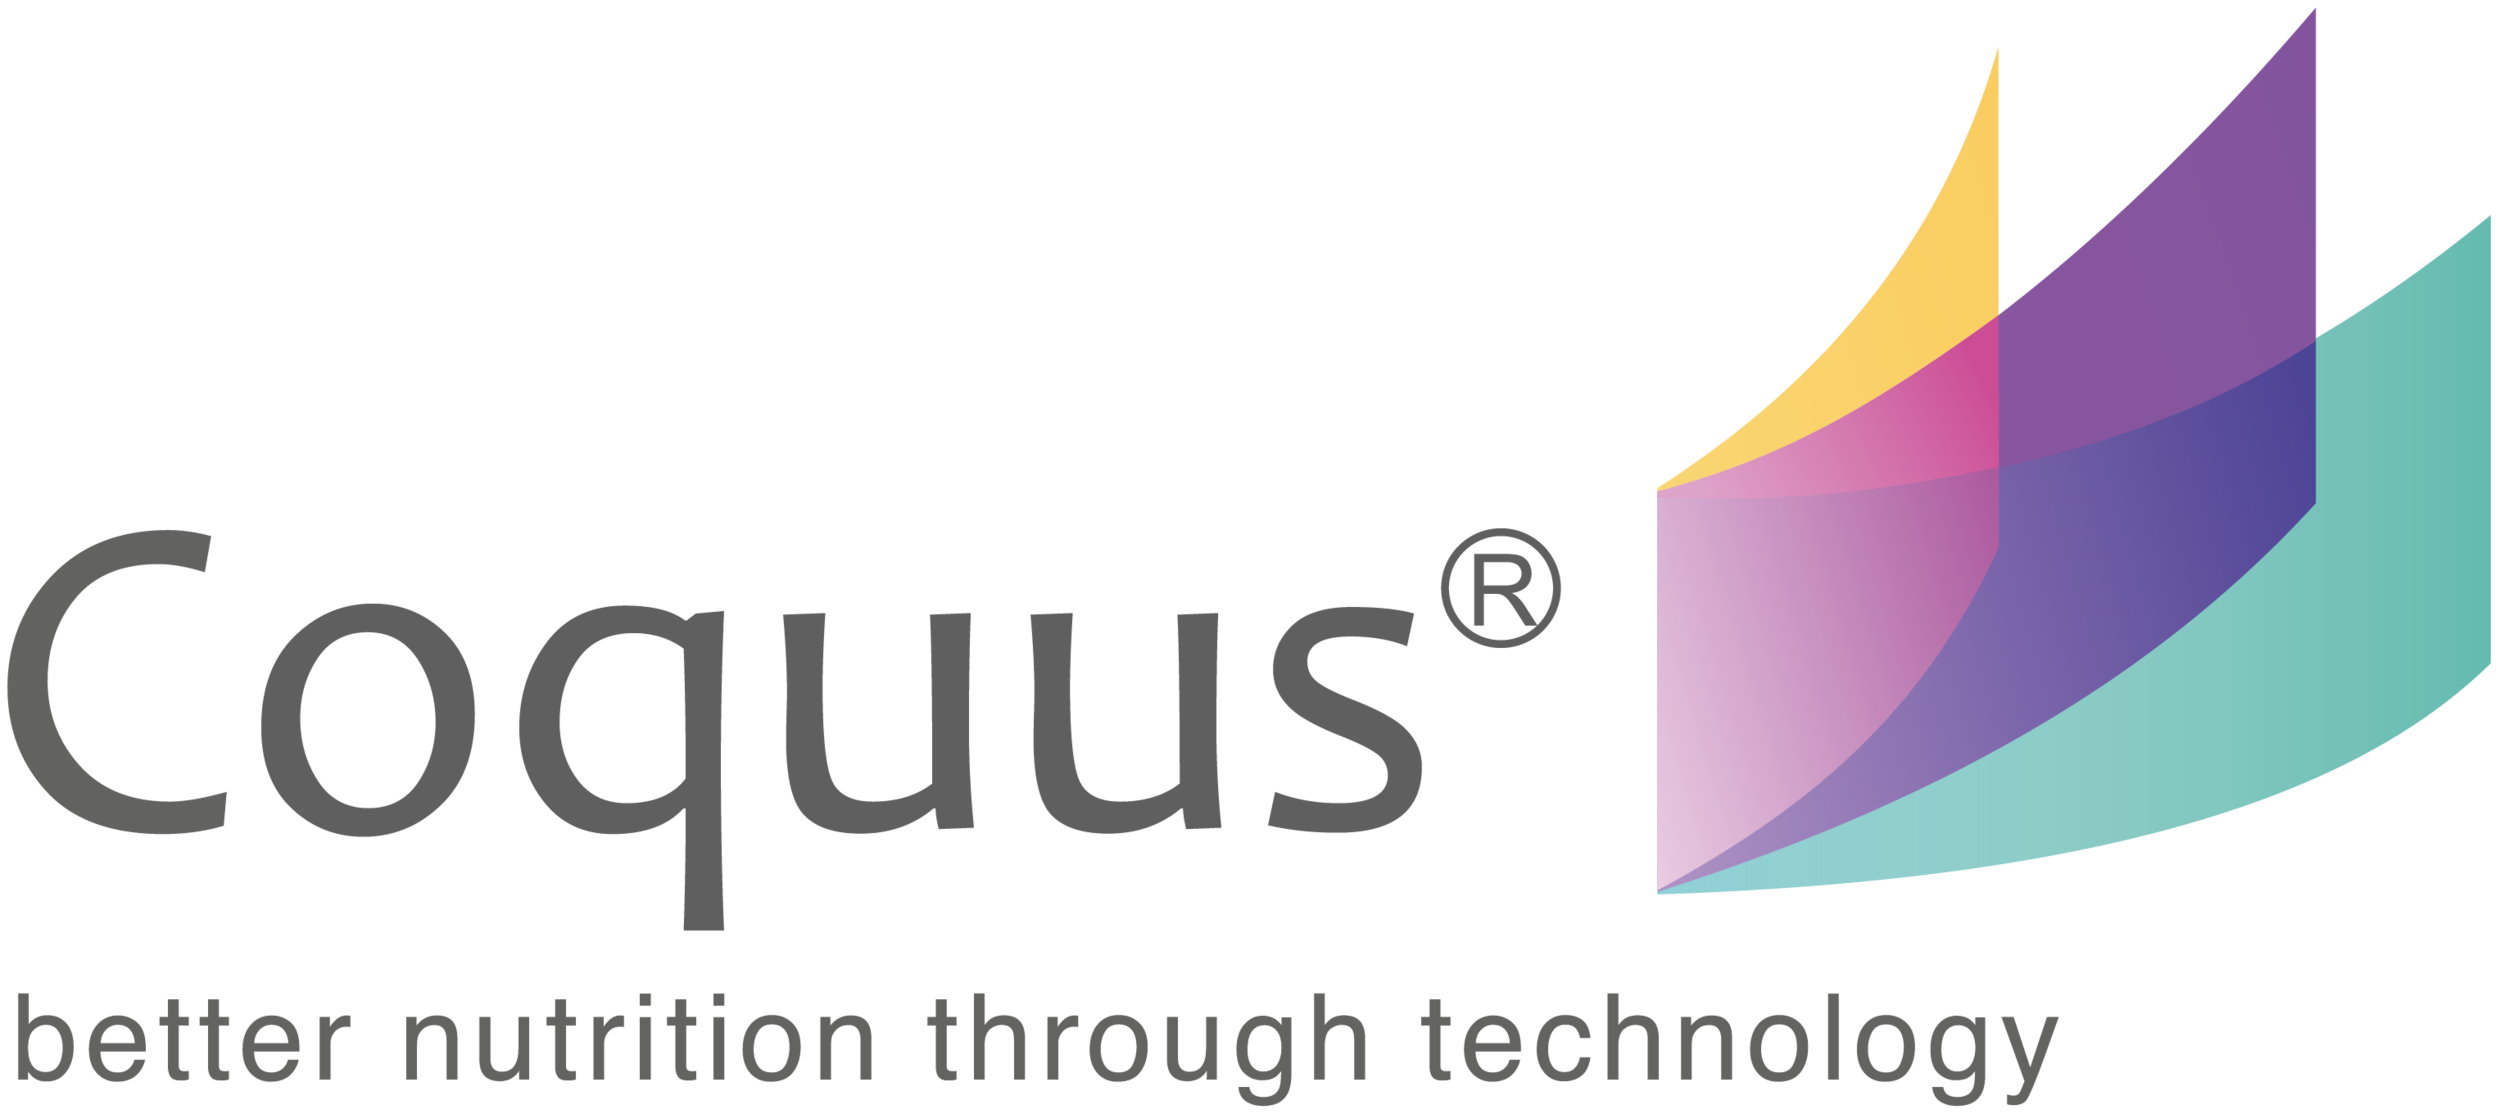 COQUUS_logo apaisado+texto inglés-02.png